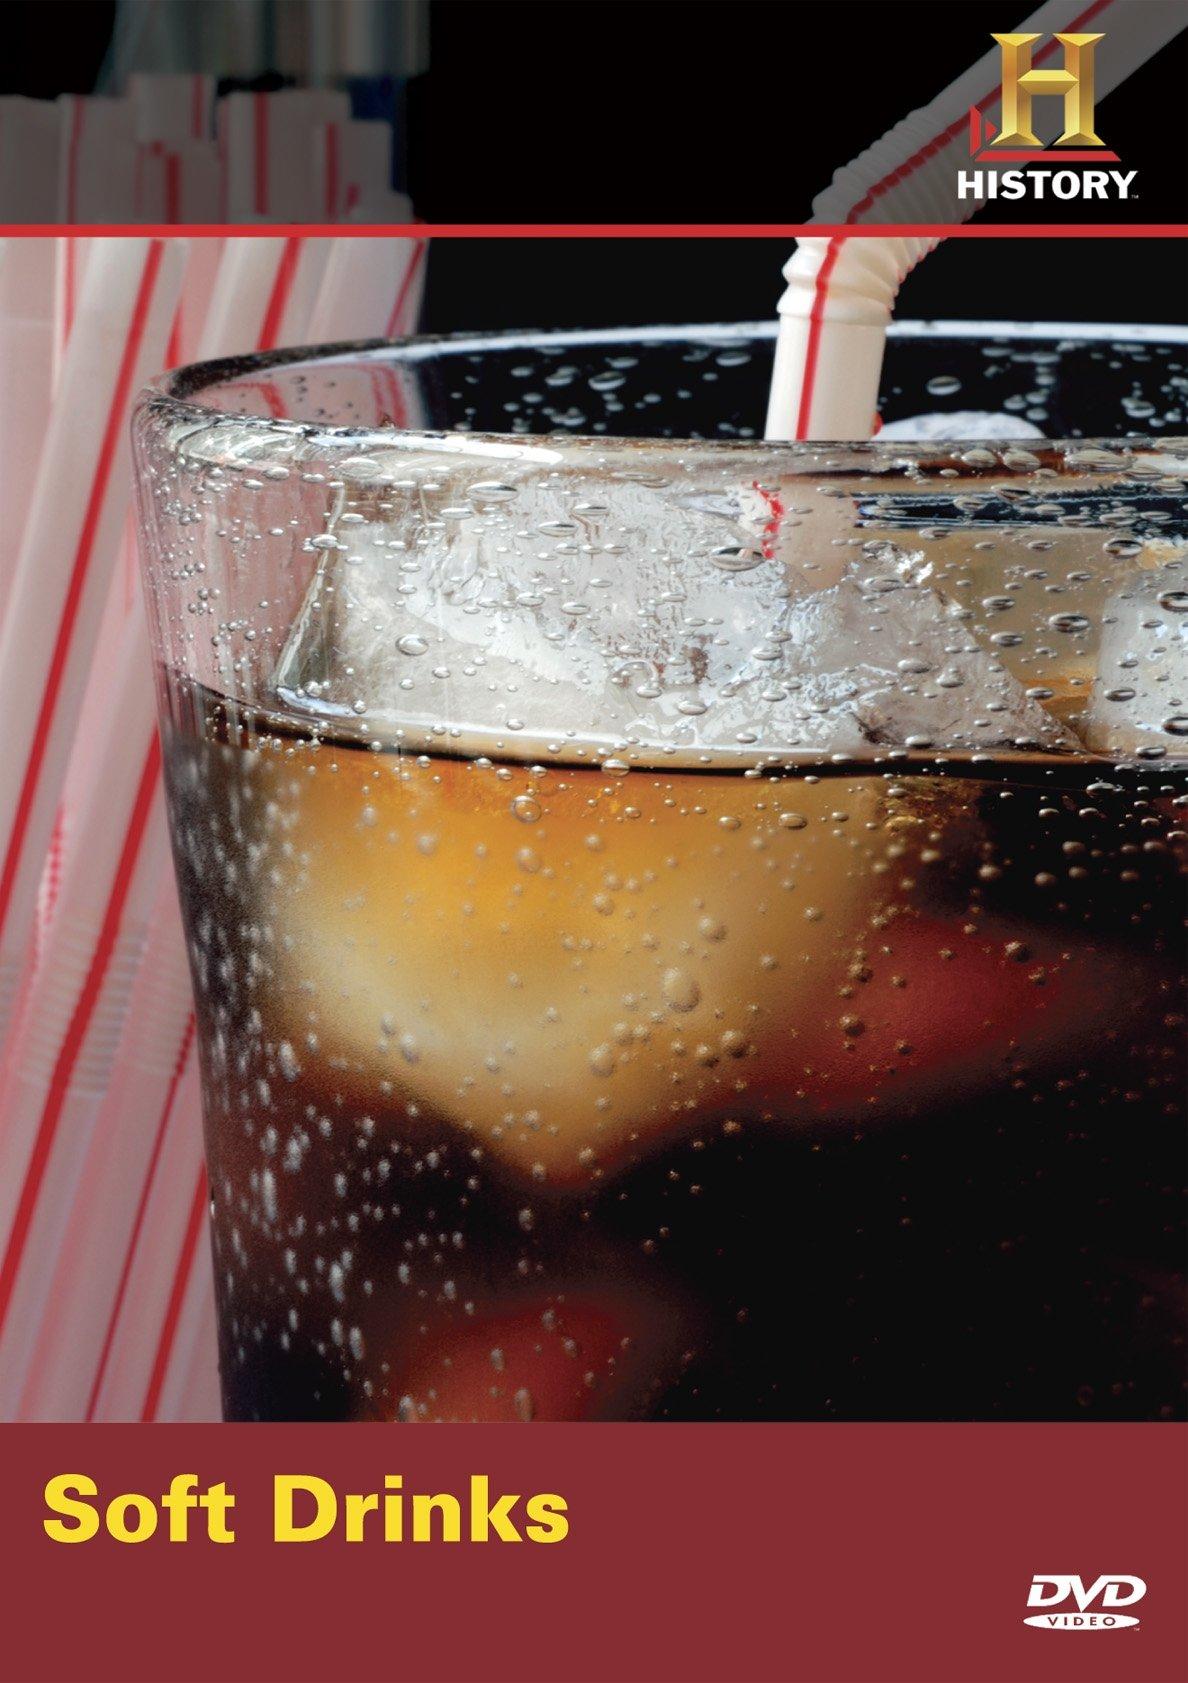 Modern Marvels: Soft Drinks (History Channel)